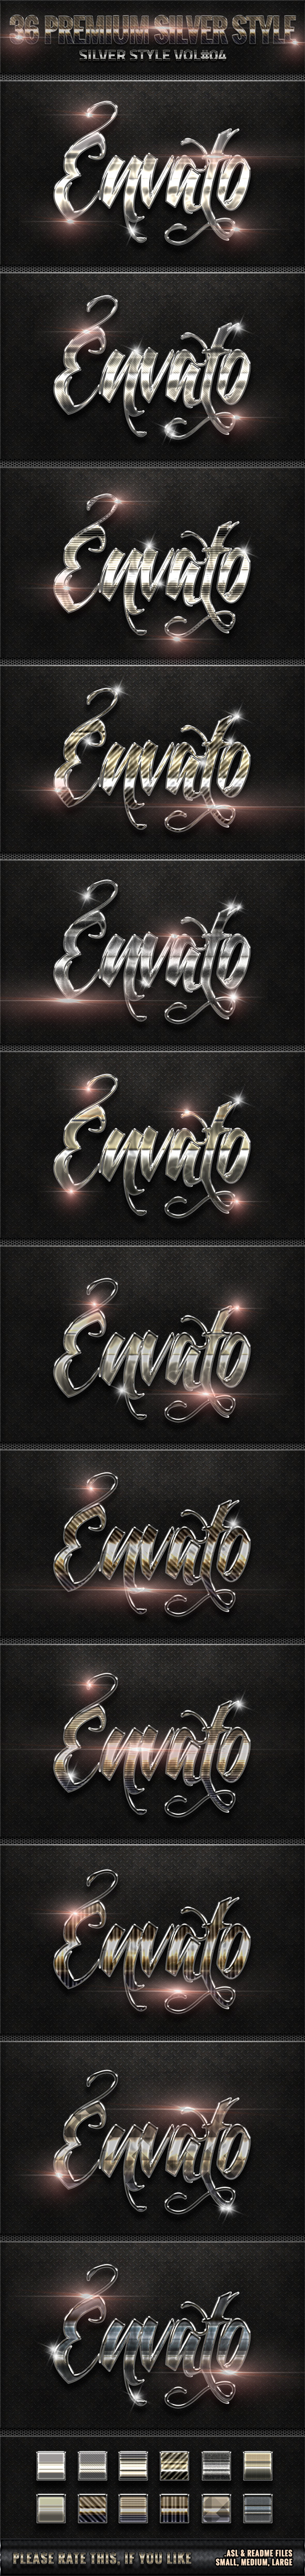 GraphicRiver Edit 36 Silver Style V04 11306848